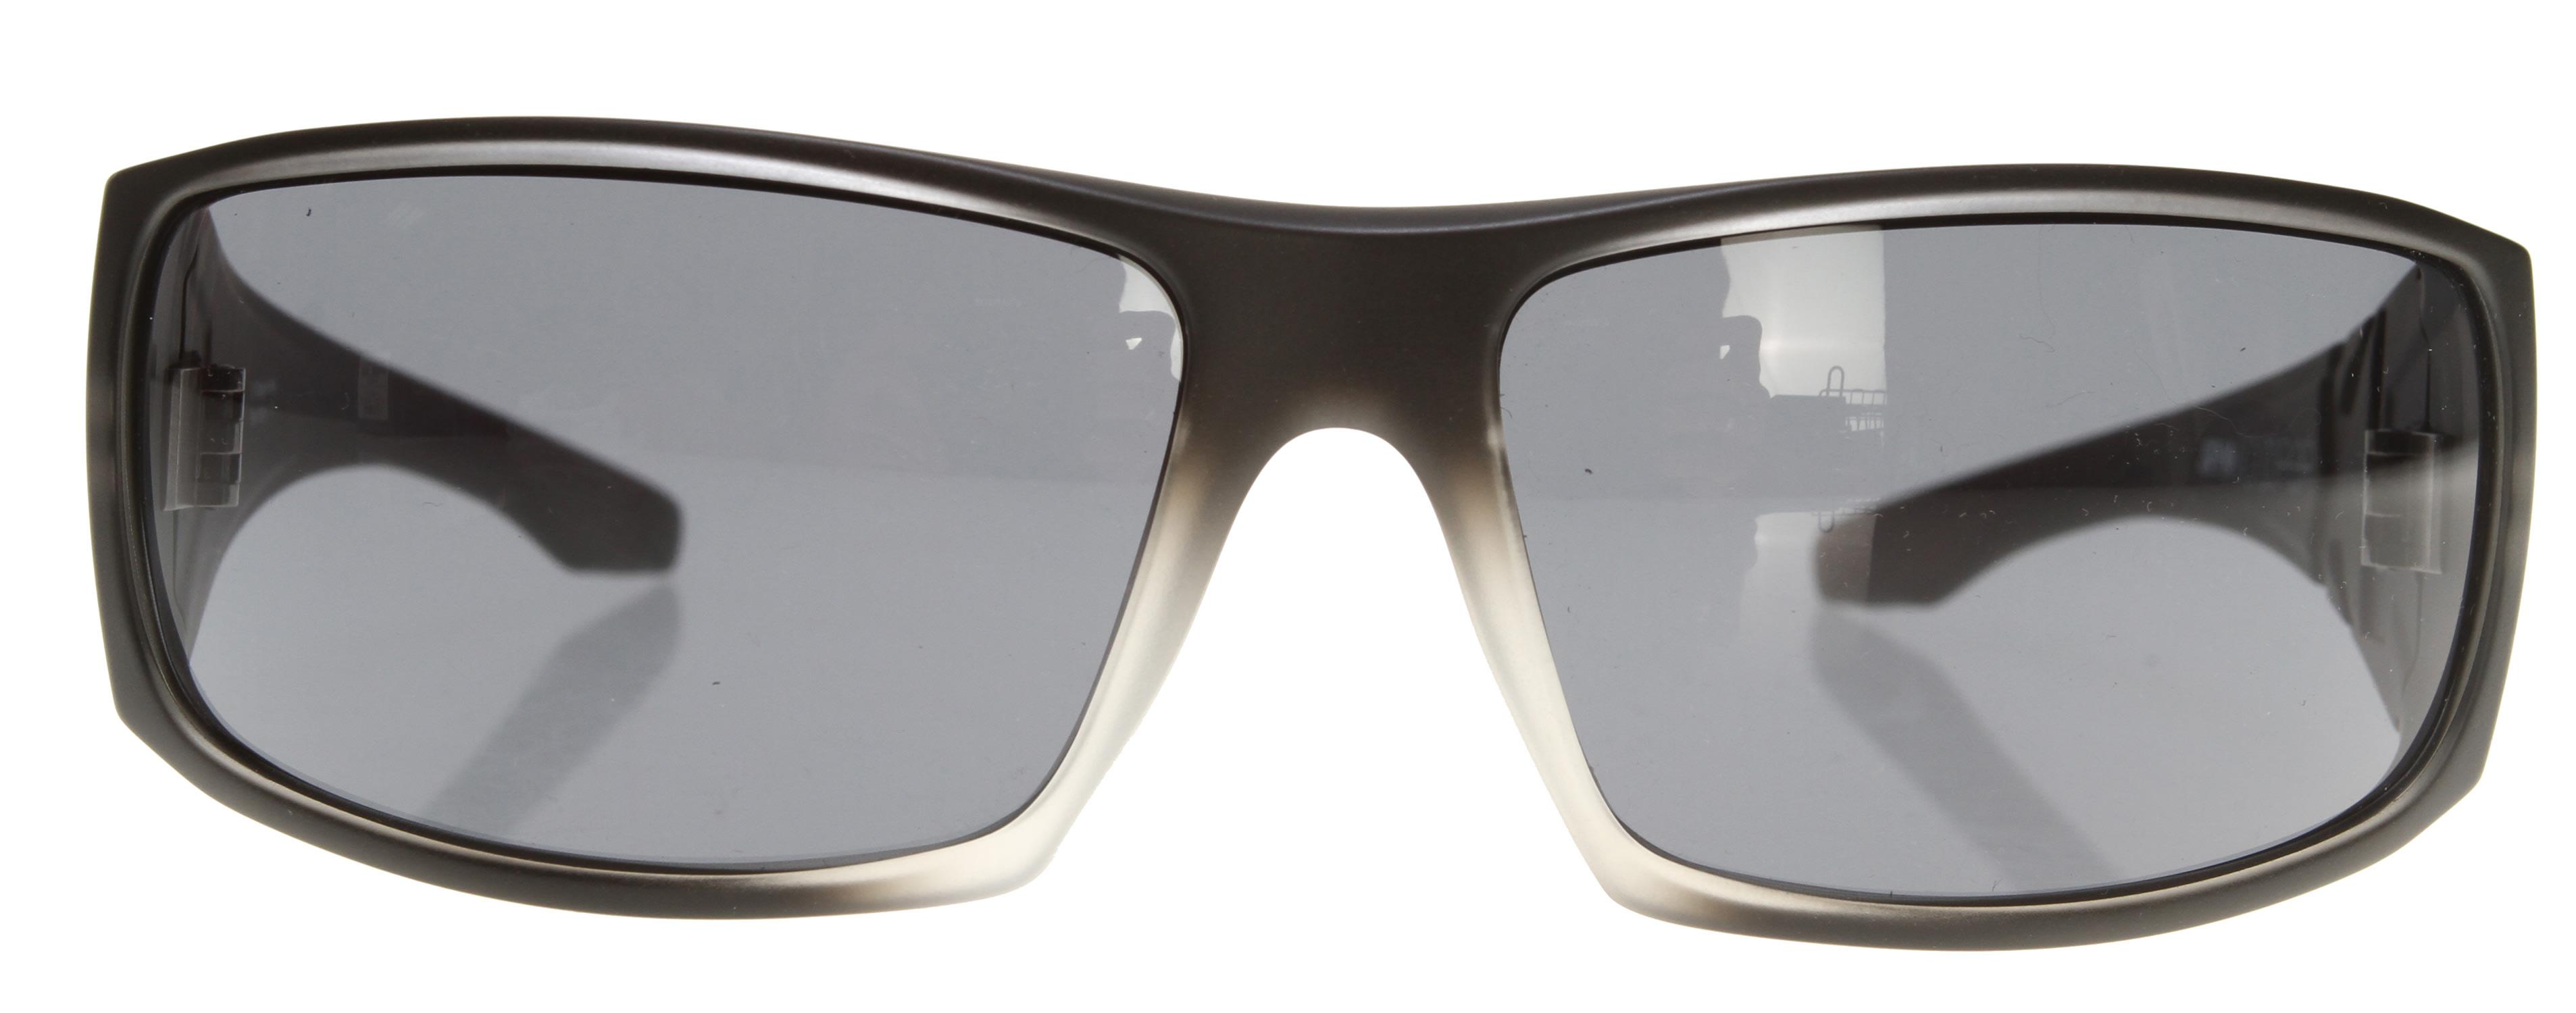 613b2d60a3940 Spy Cooper XL Sunglasses - thumbnail 3